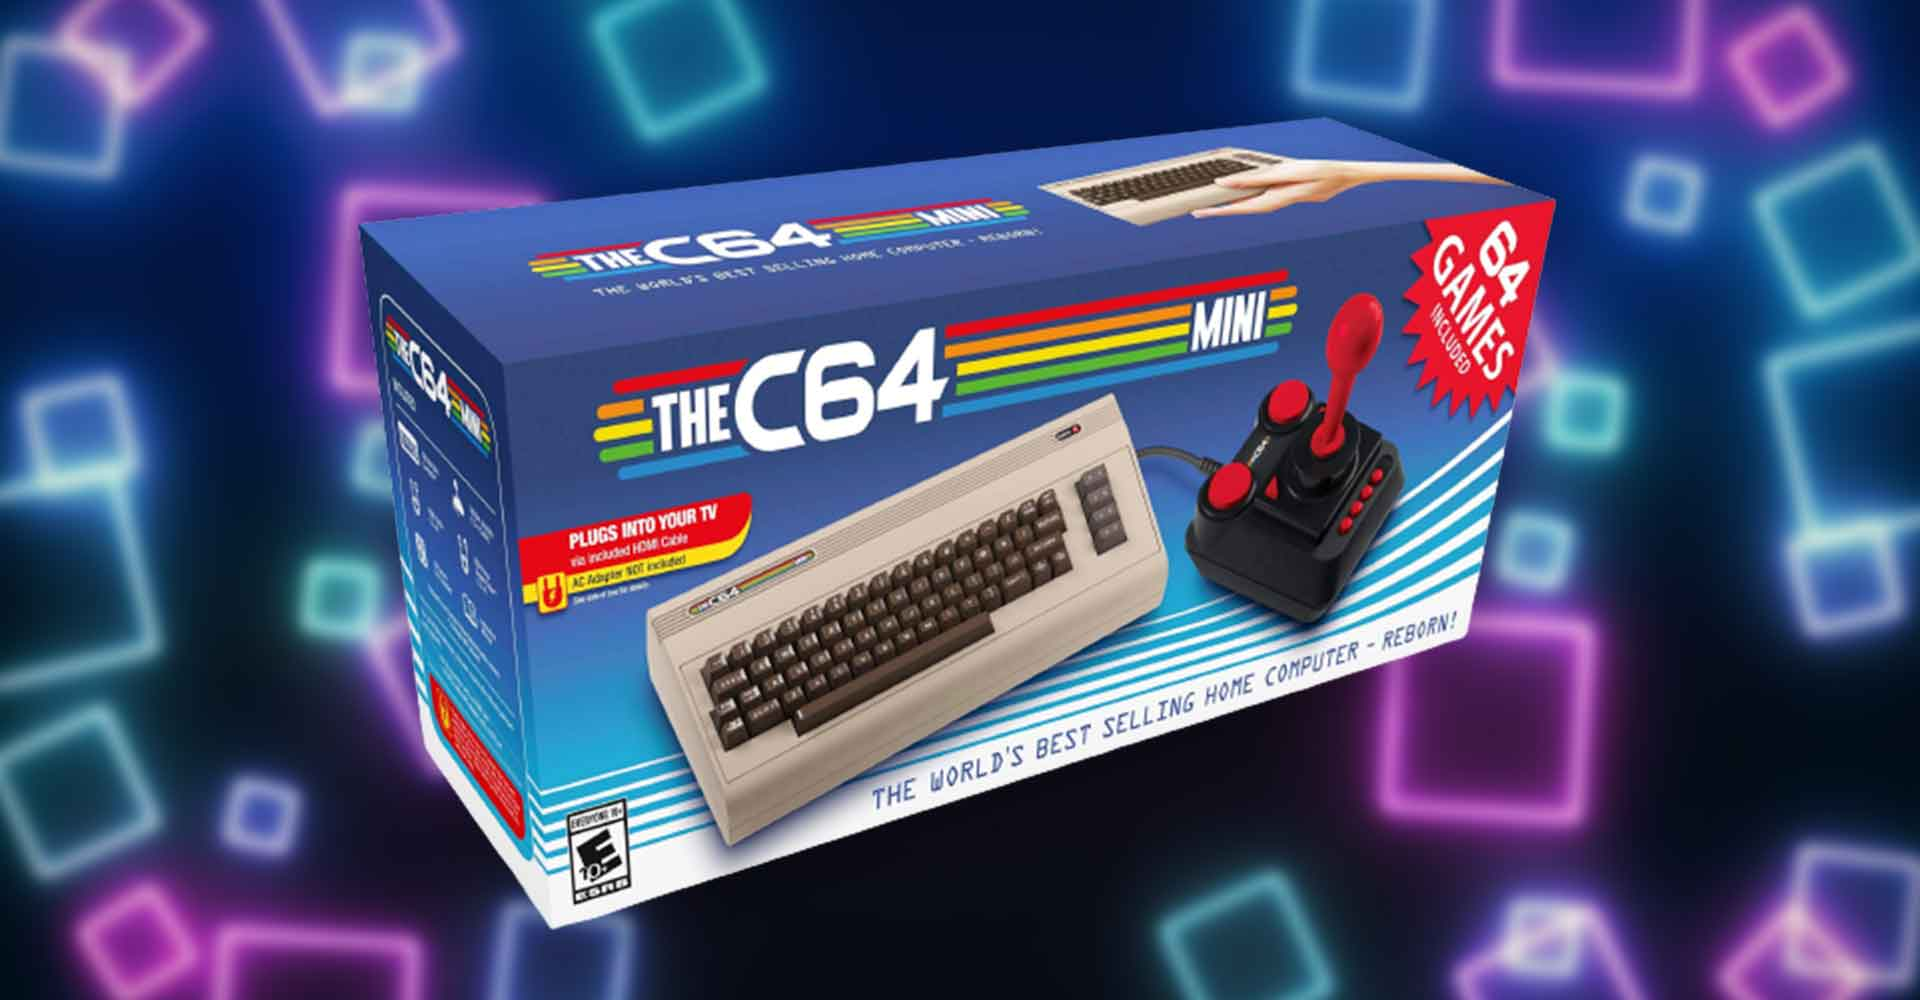 Retro- und Minikonsolen #8 C64 Mini: Tastatur nur Replik